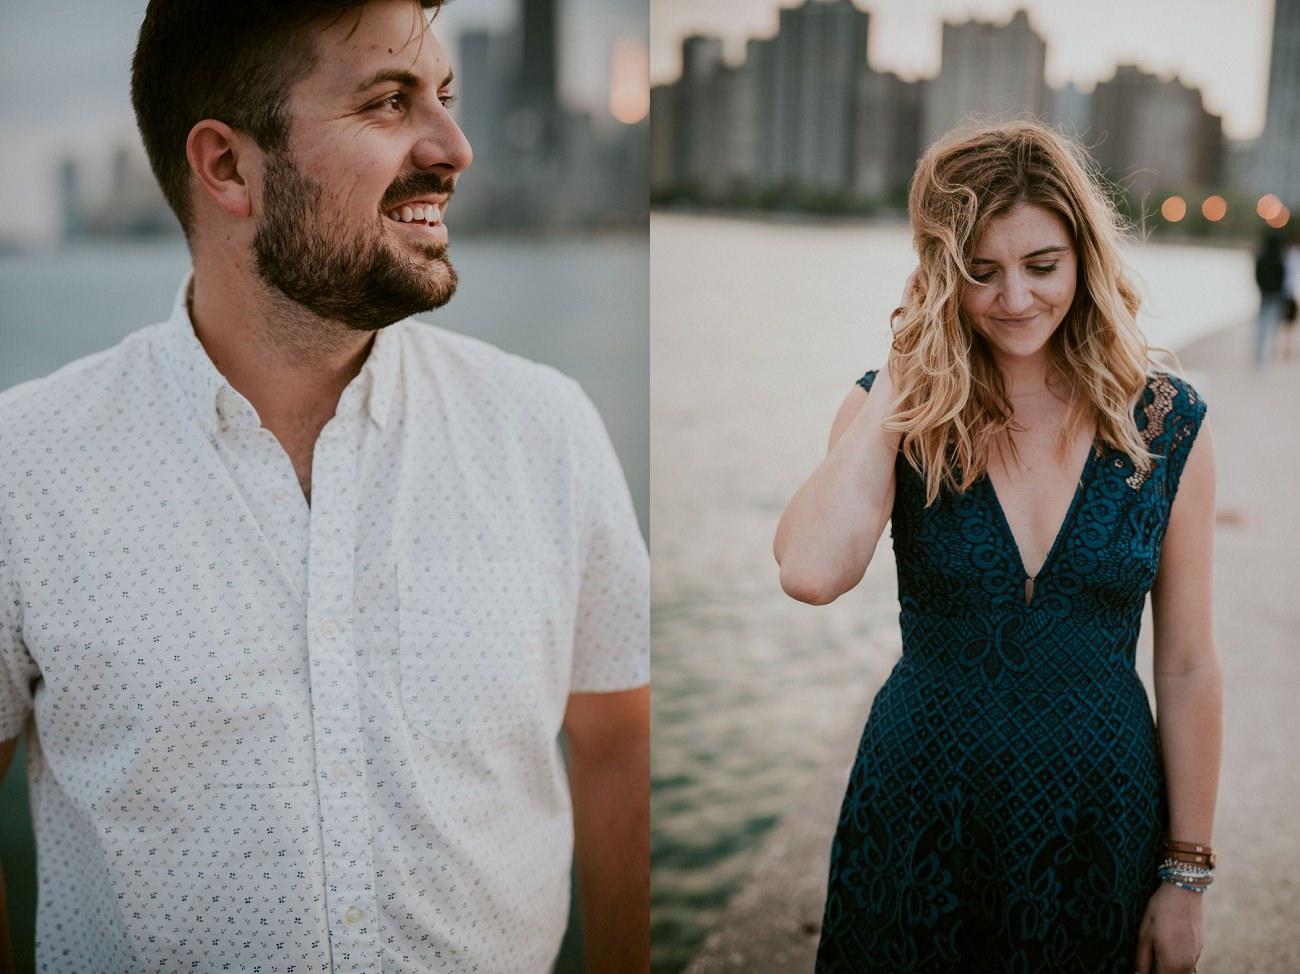 Lakeview Park Chicago Illinois, Chicago Wedding Photographer